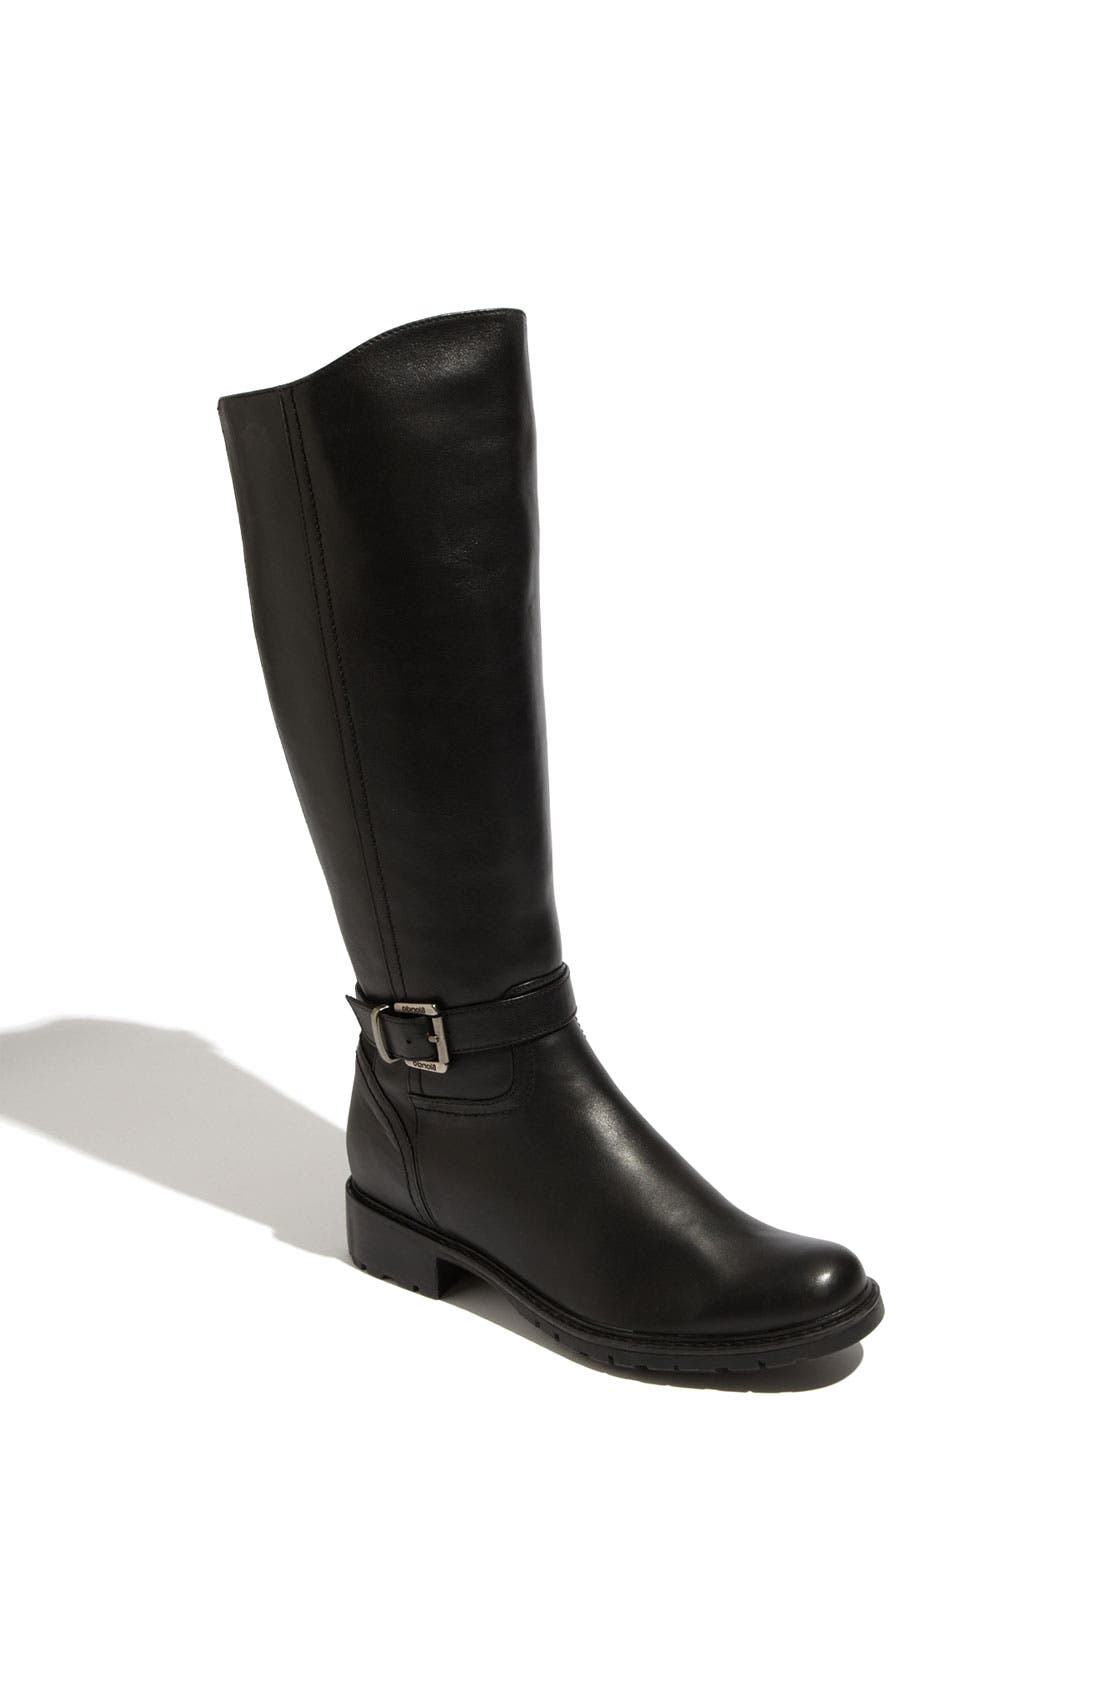 Alternate Image 1 Selected - Blondo 'Viviane' Waterproof Boot (Wide Calf)